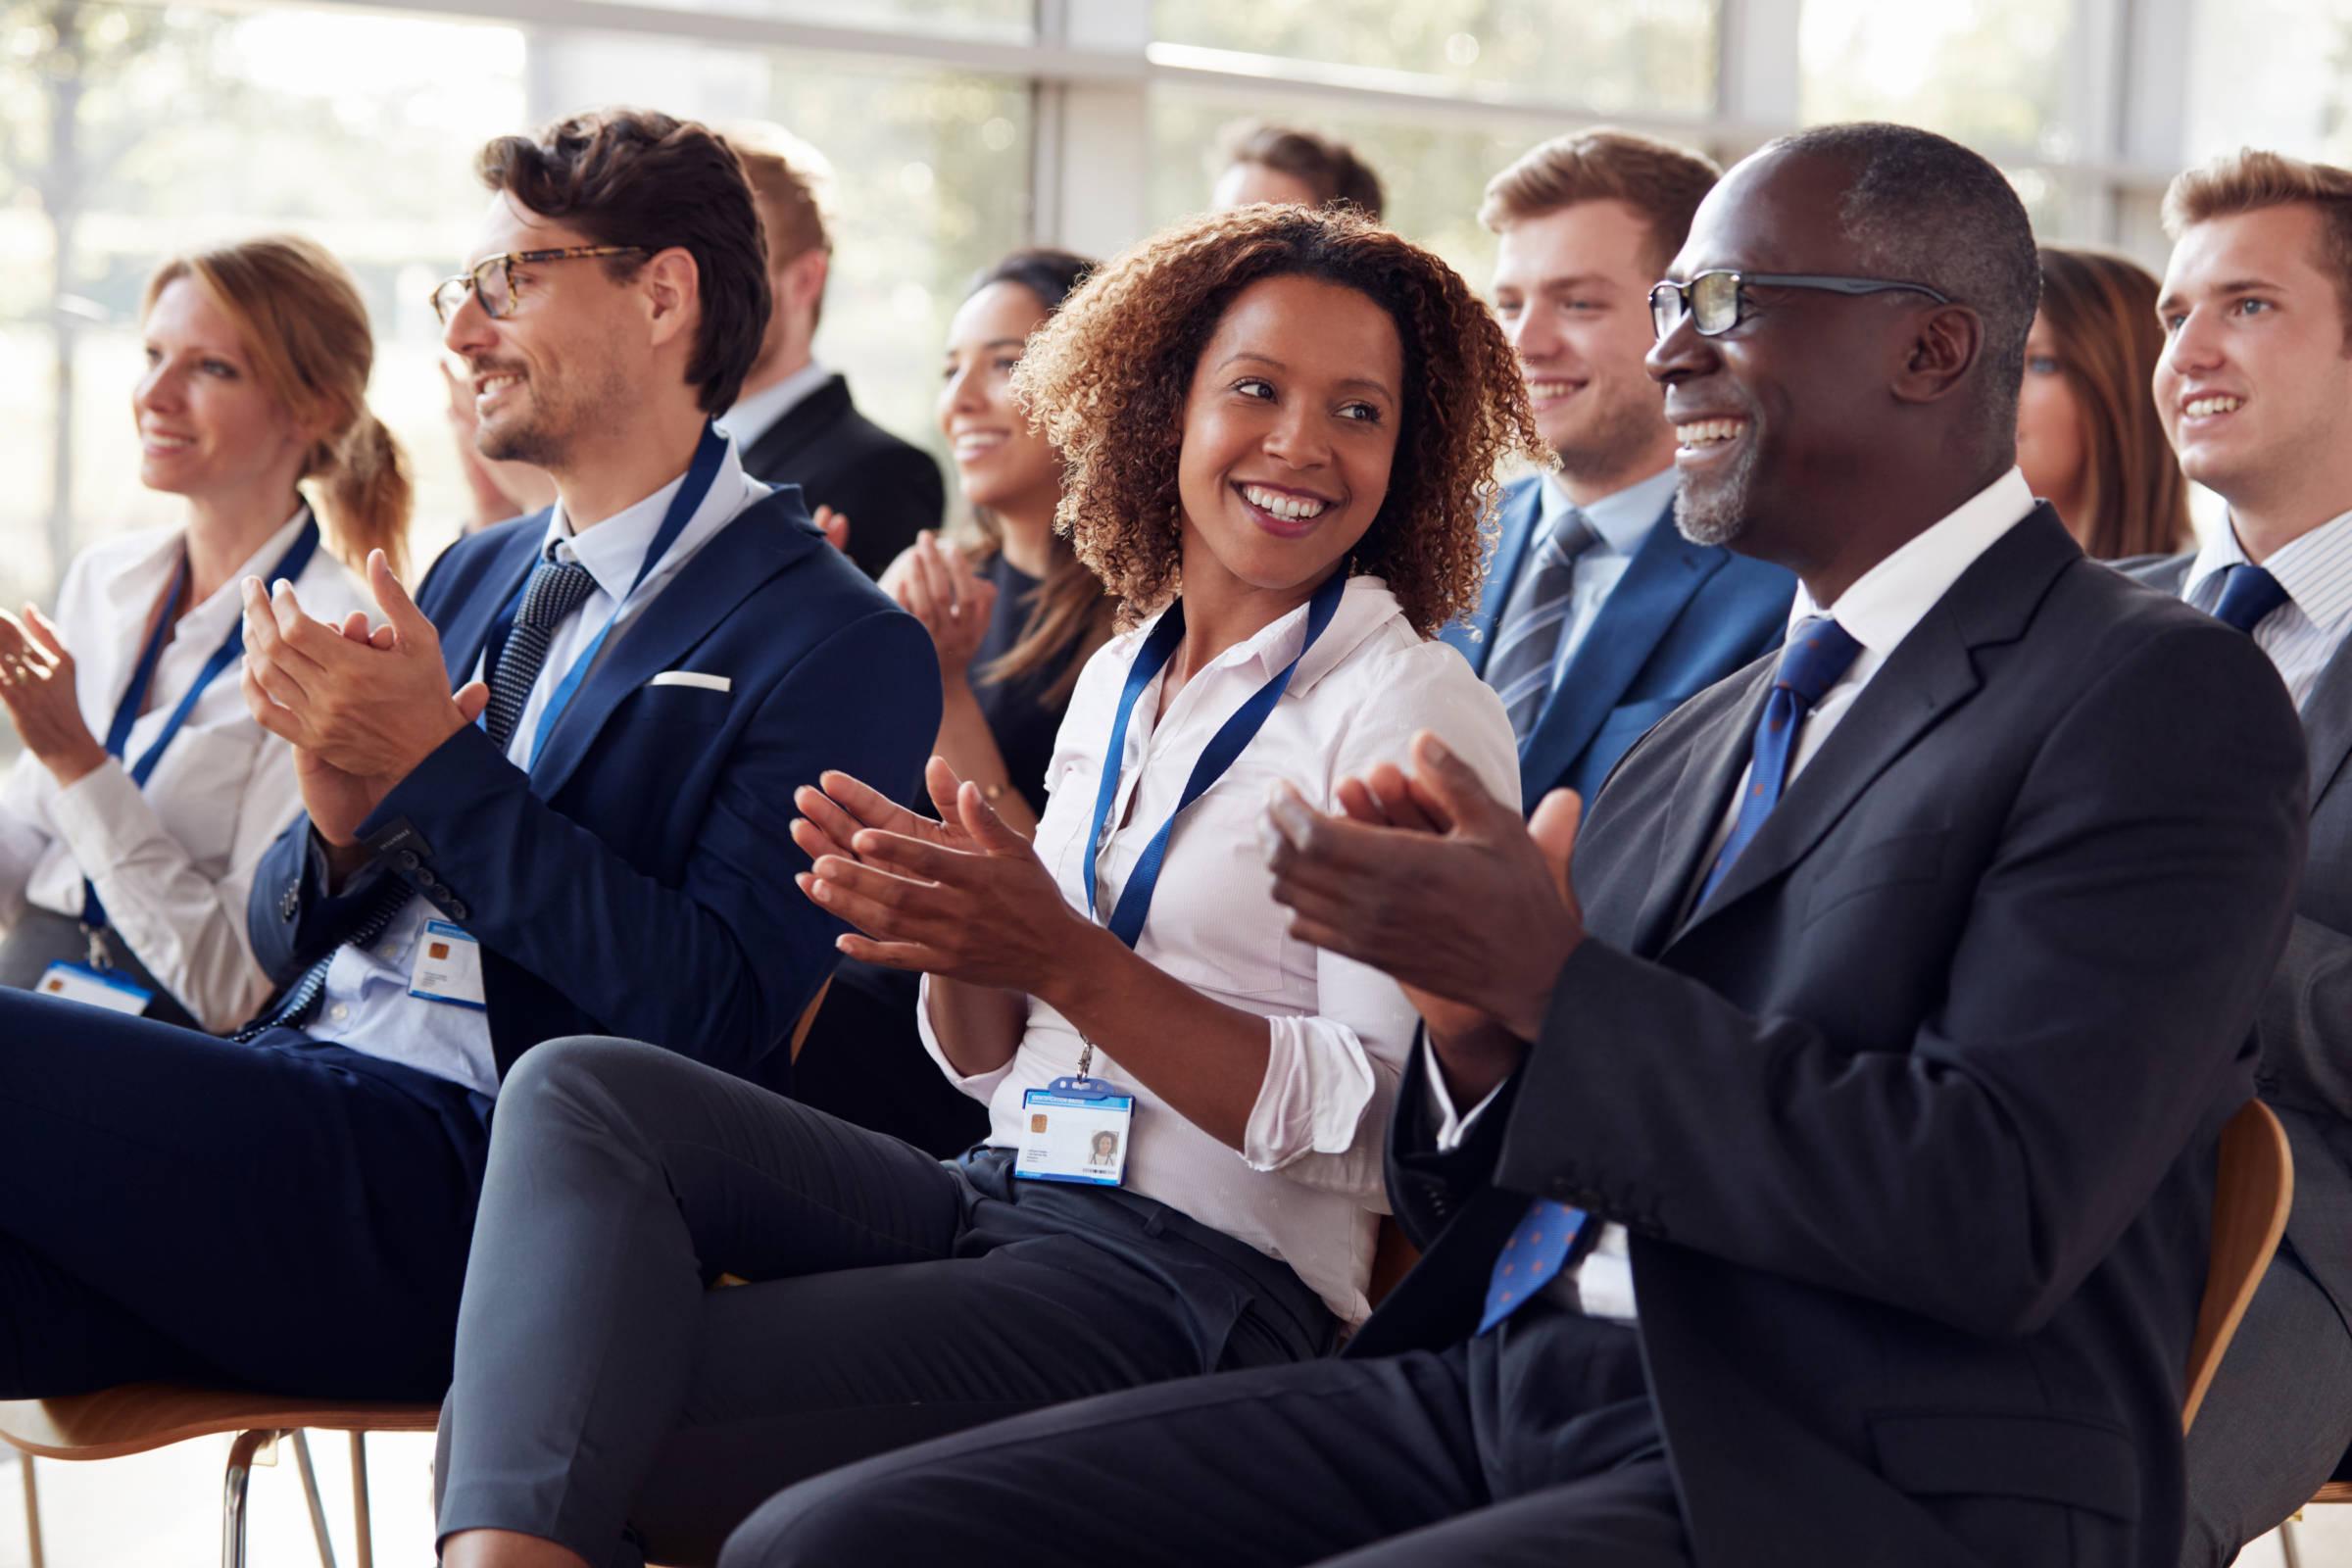 PRESS RELEASE: Major Conference Success for Team Evolve Marketing